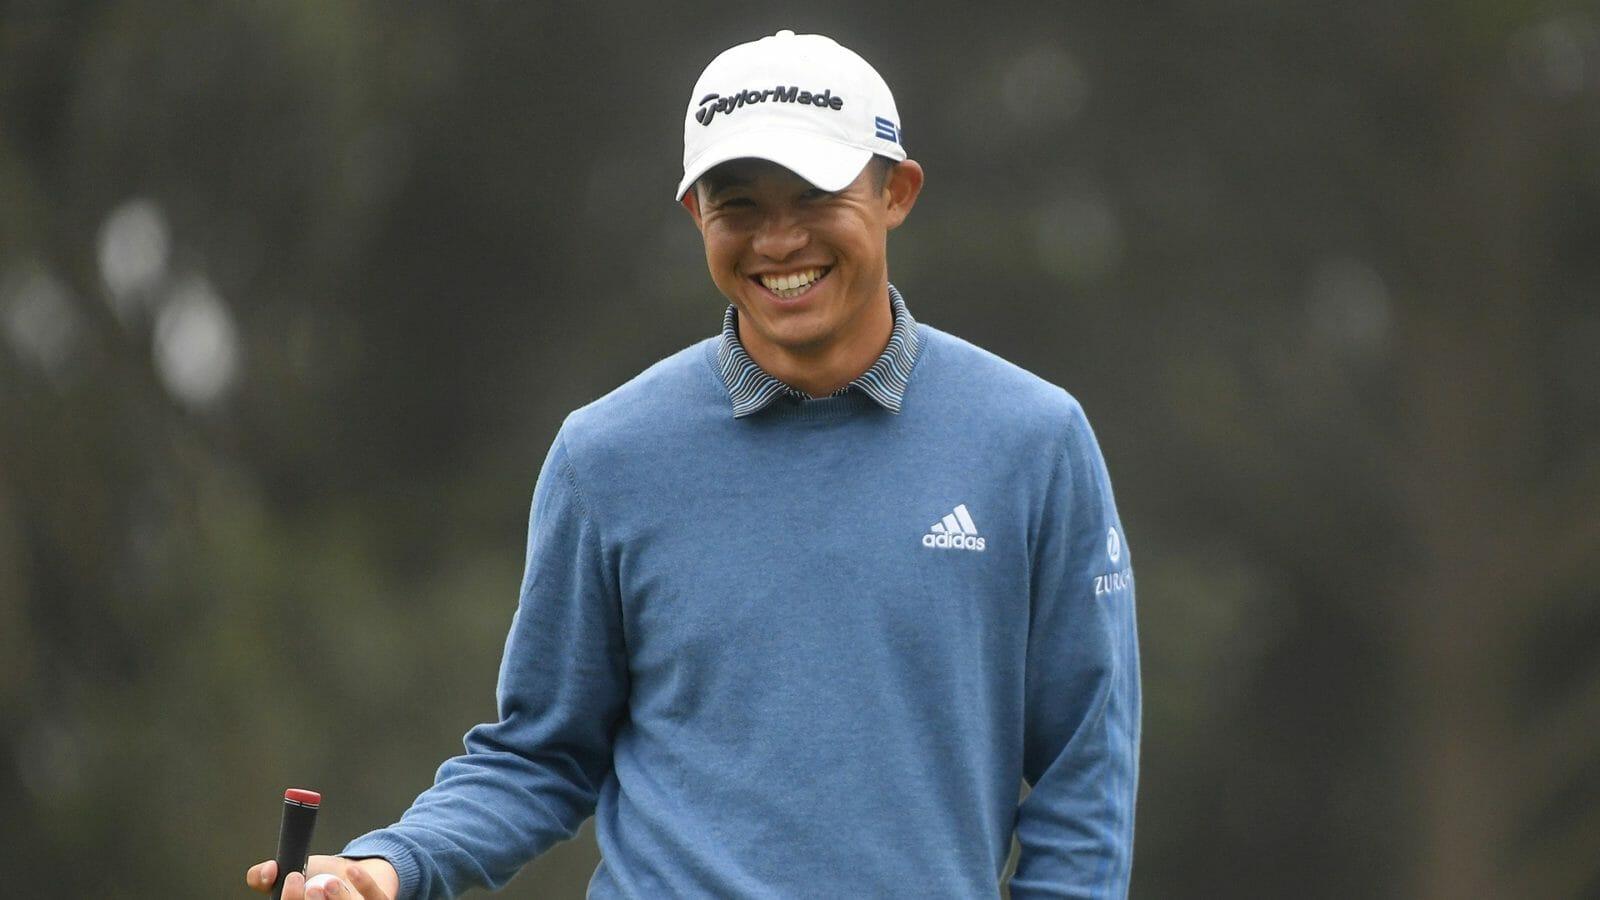 Collin Morikawa wins the 2020 PGA Championship